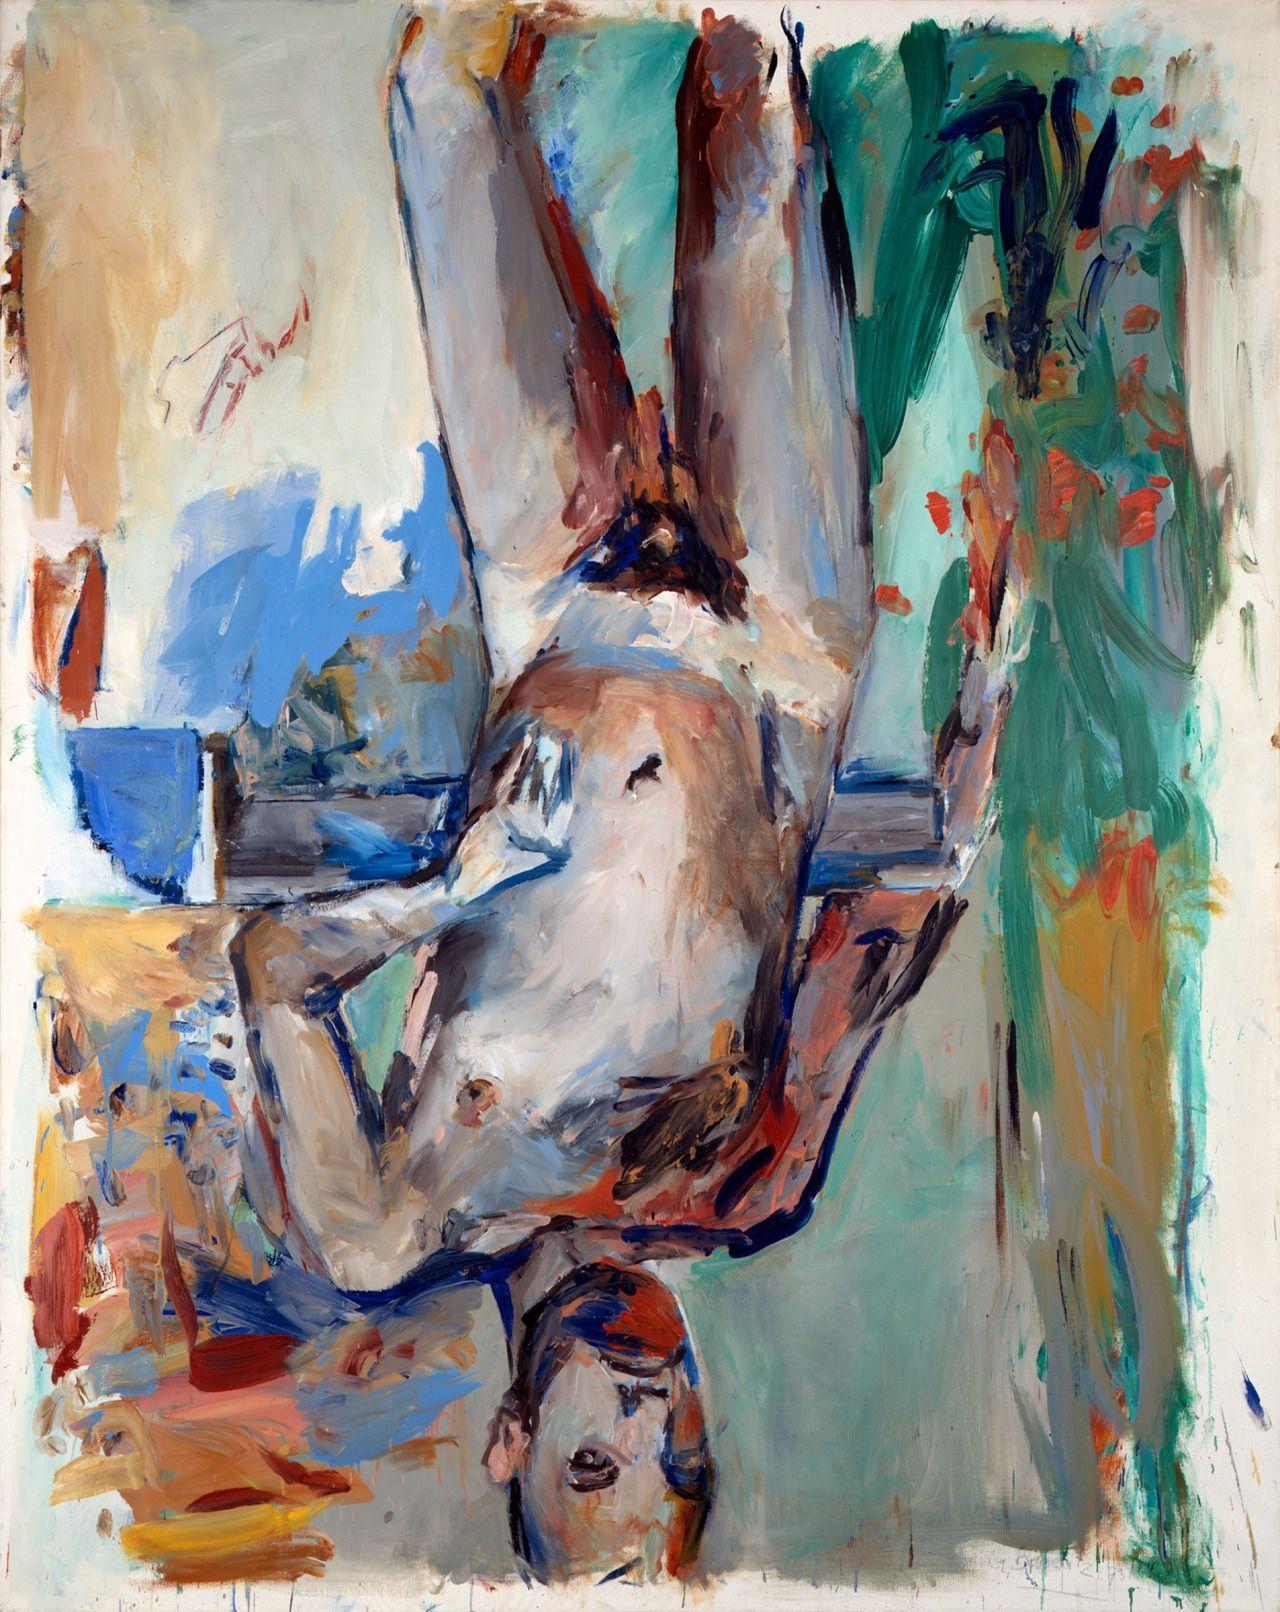 Georg Baselitz, Male Nude (Self Portrait), 1973-74 / Fingerpainting, oil on canvas